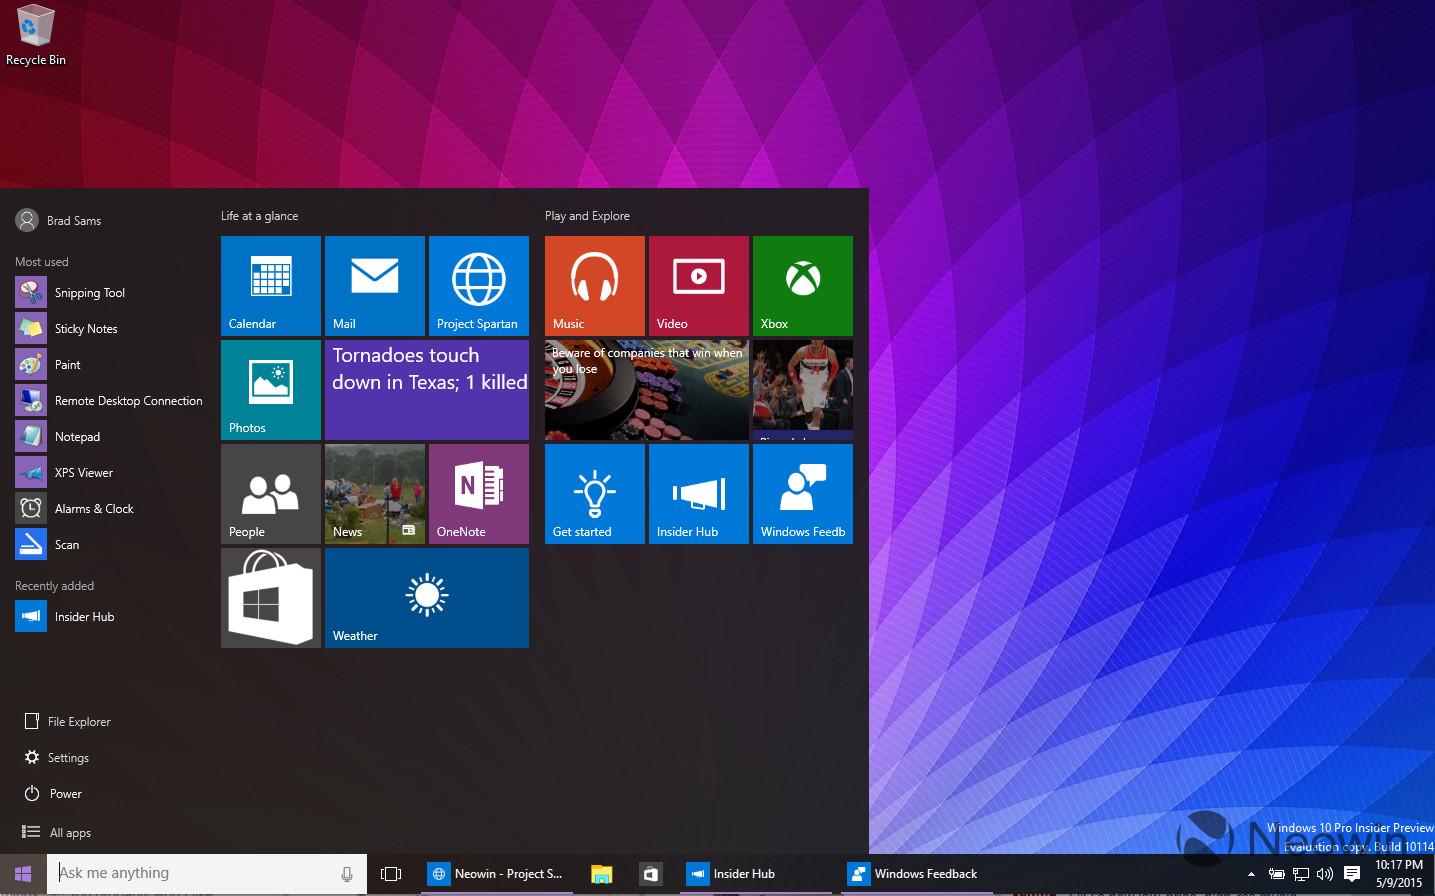 Screenshots of windows 10 build 10114 leaked online mspoweruser windows 10 build 10114 1 ccuart Choice Image